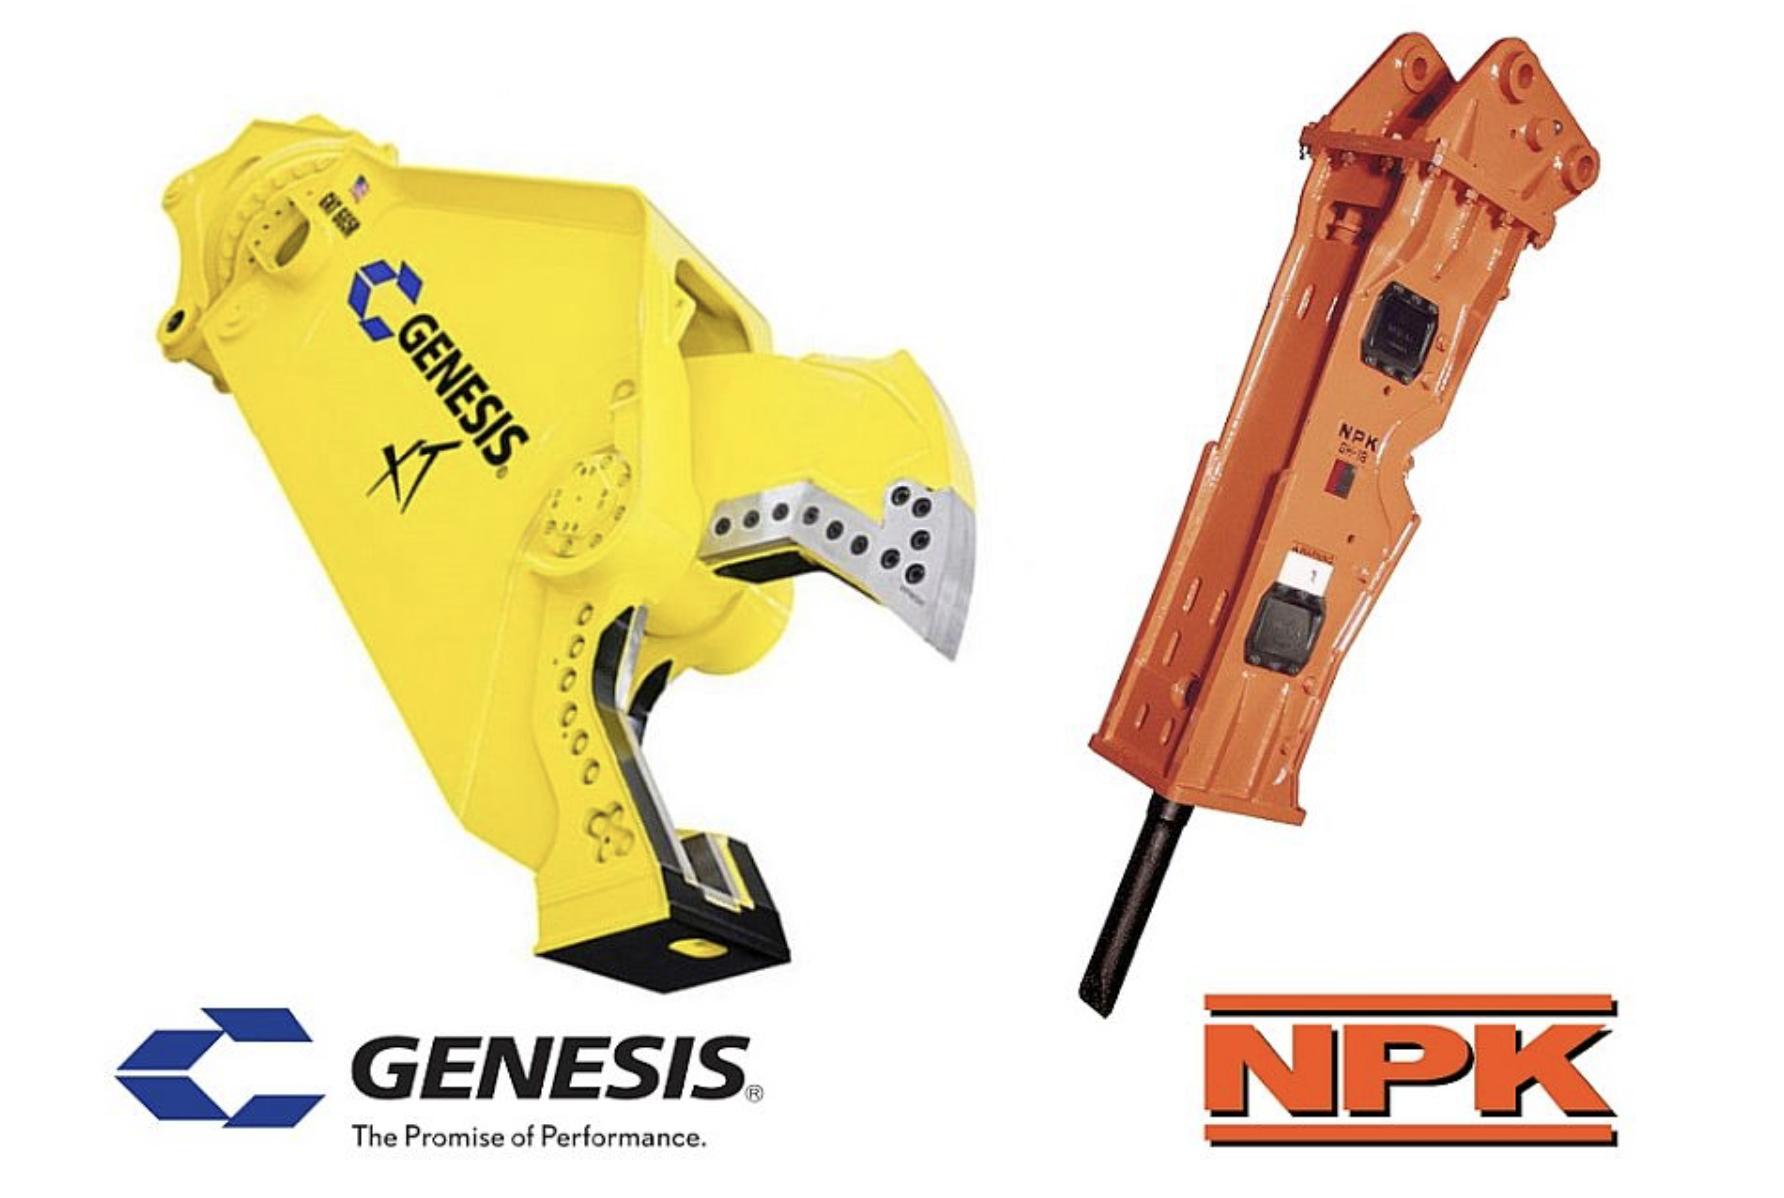 genesis and npk tools